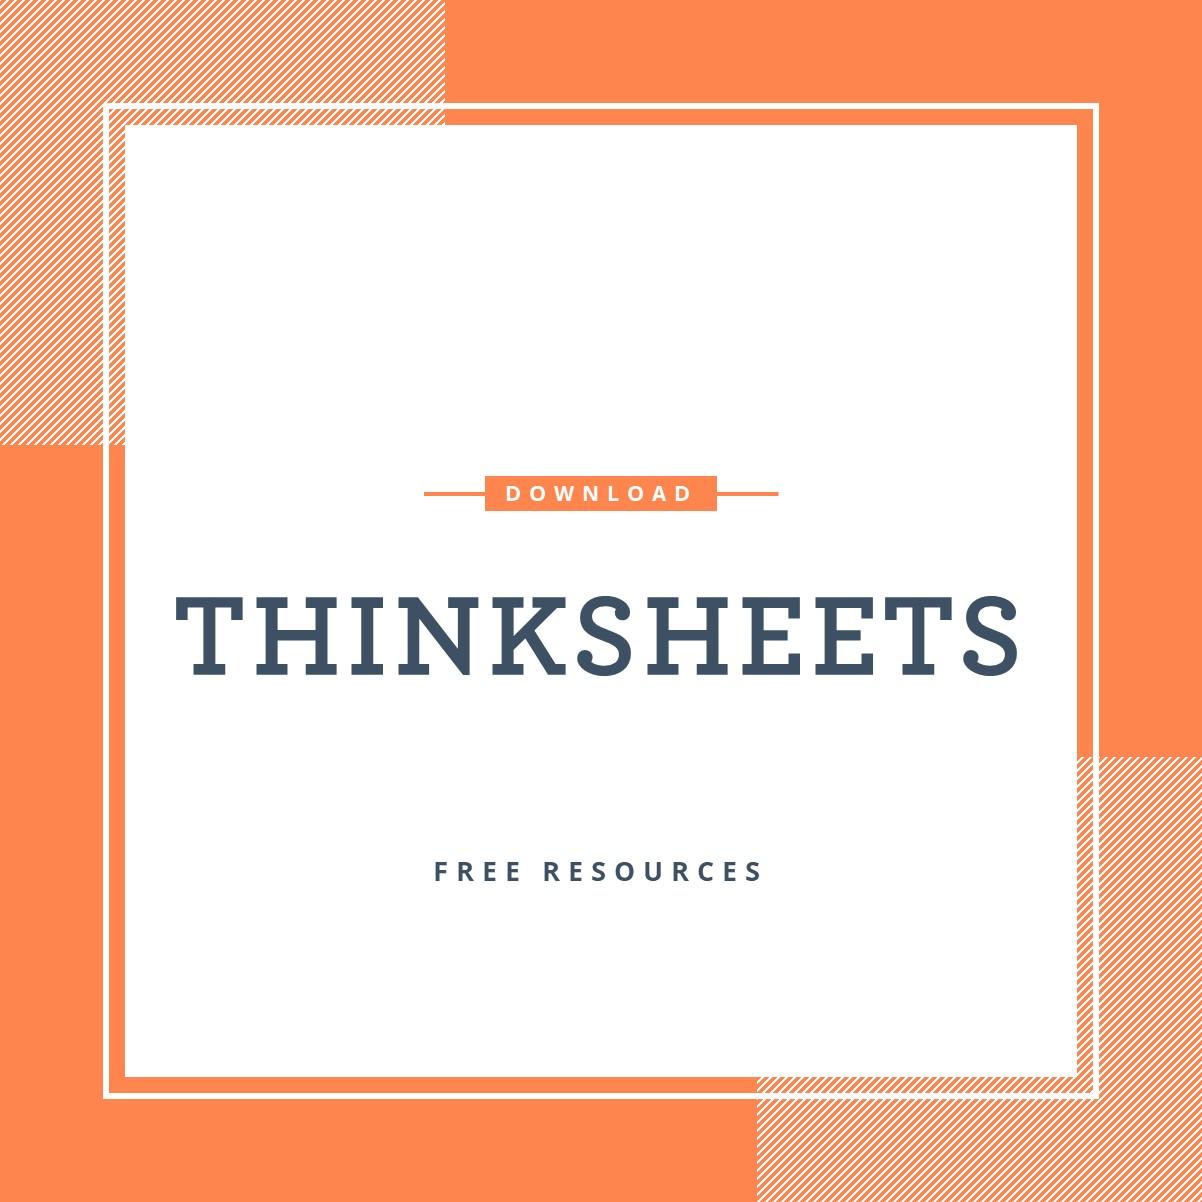 Thinksheets-member-nav.jpg